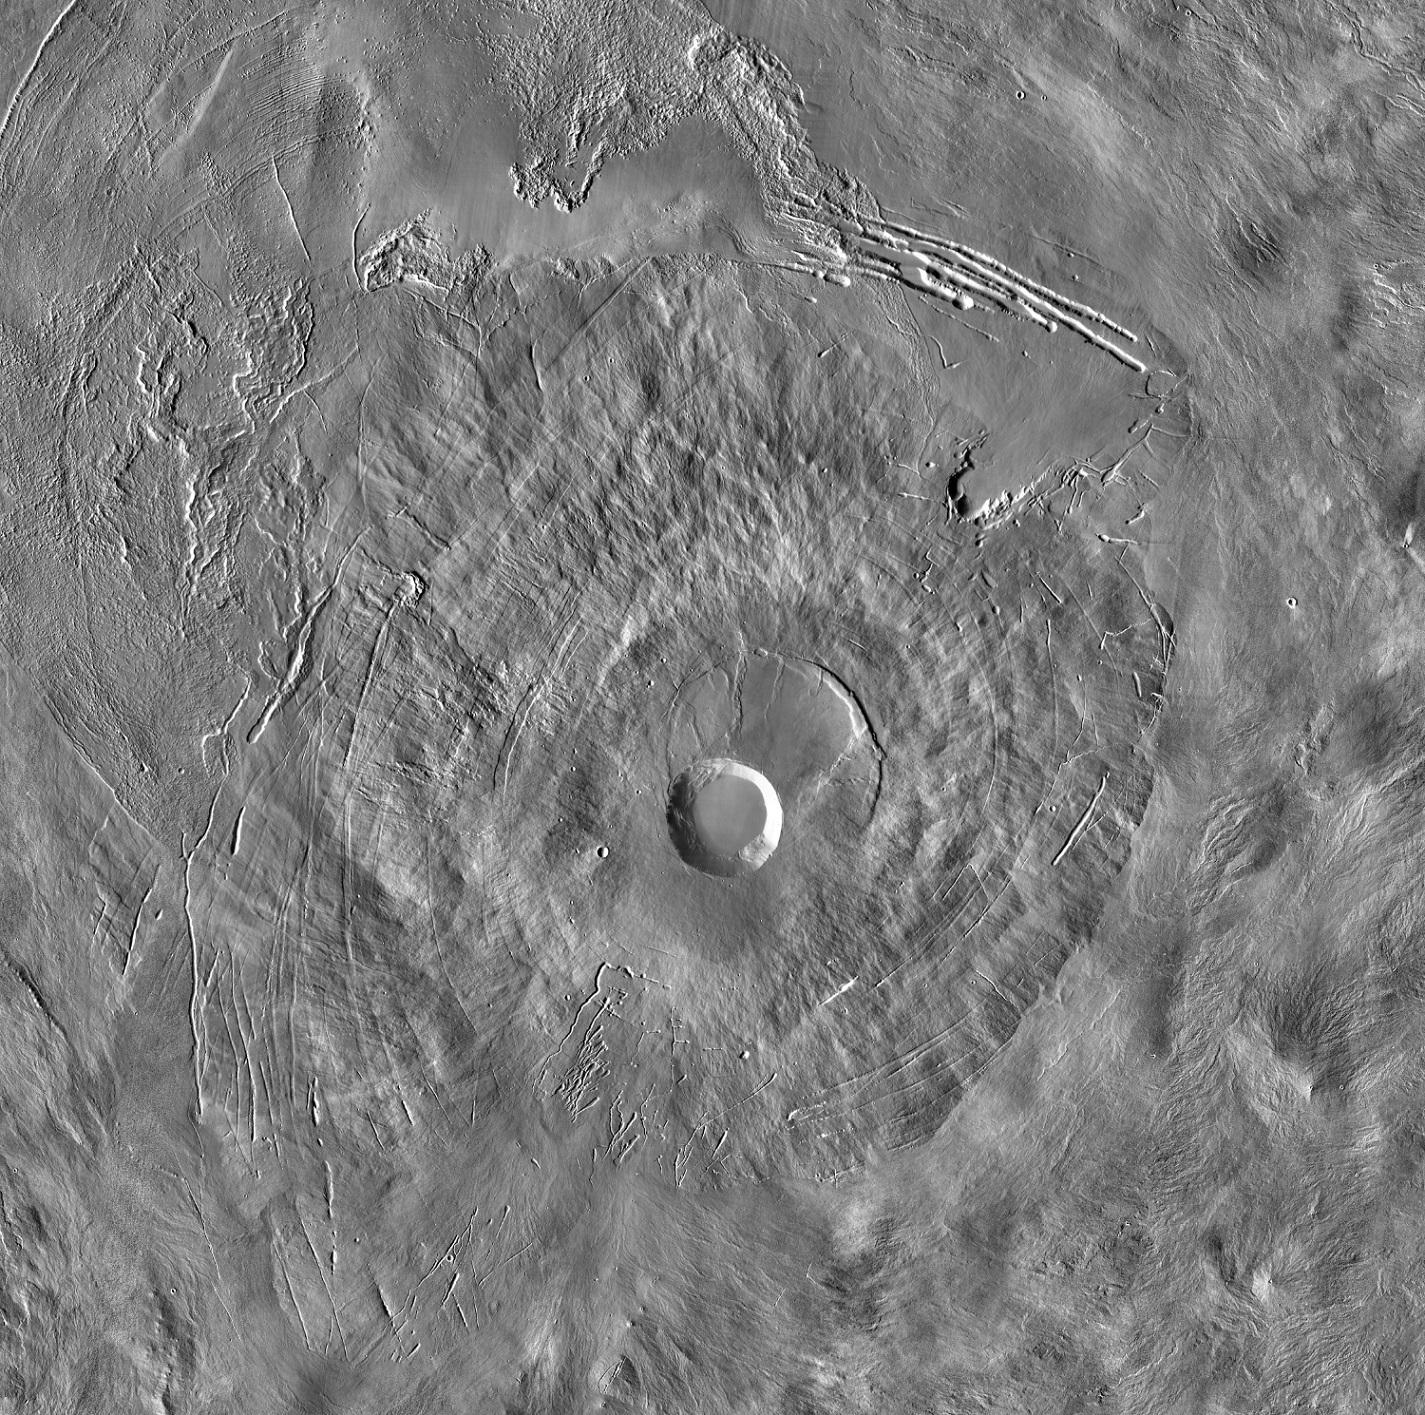 Pavonis Mons on Mars